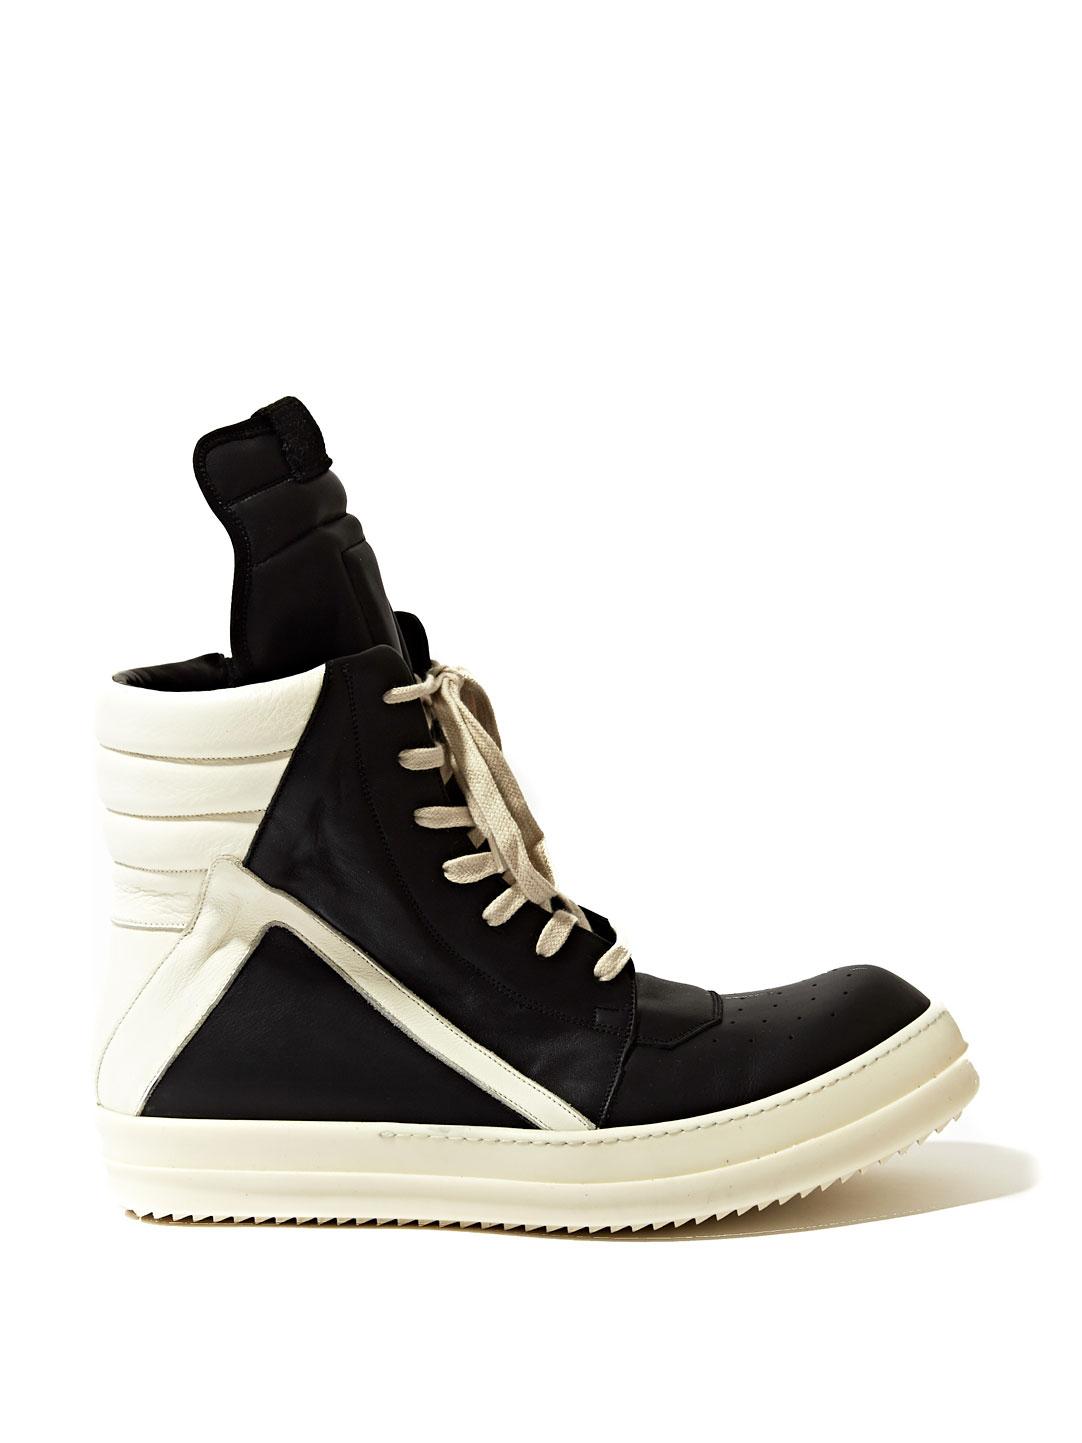 rick owens mens geobasket sneakers in black for men lyst. Black Bedroom Furniture Sets. Home Design Ideas